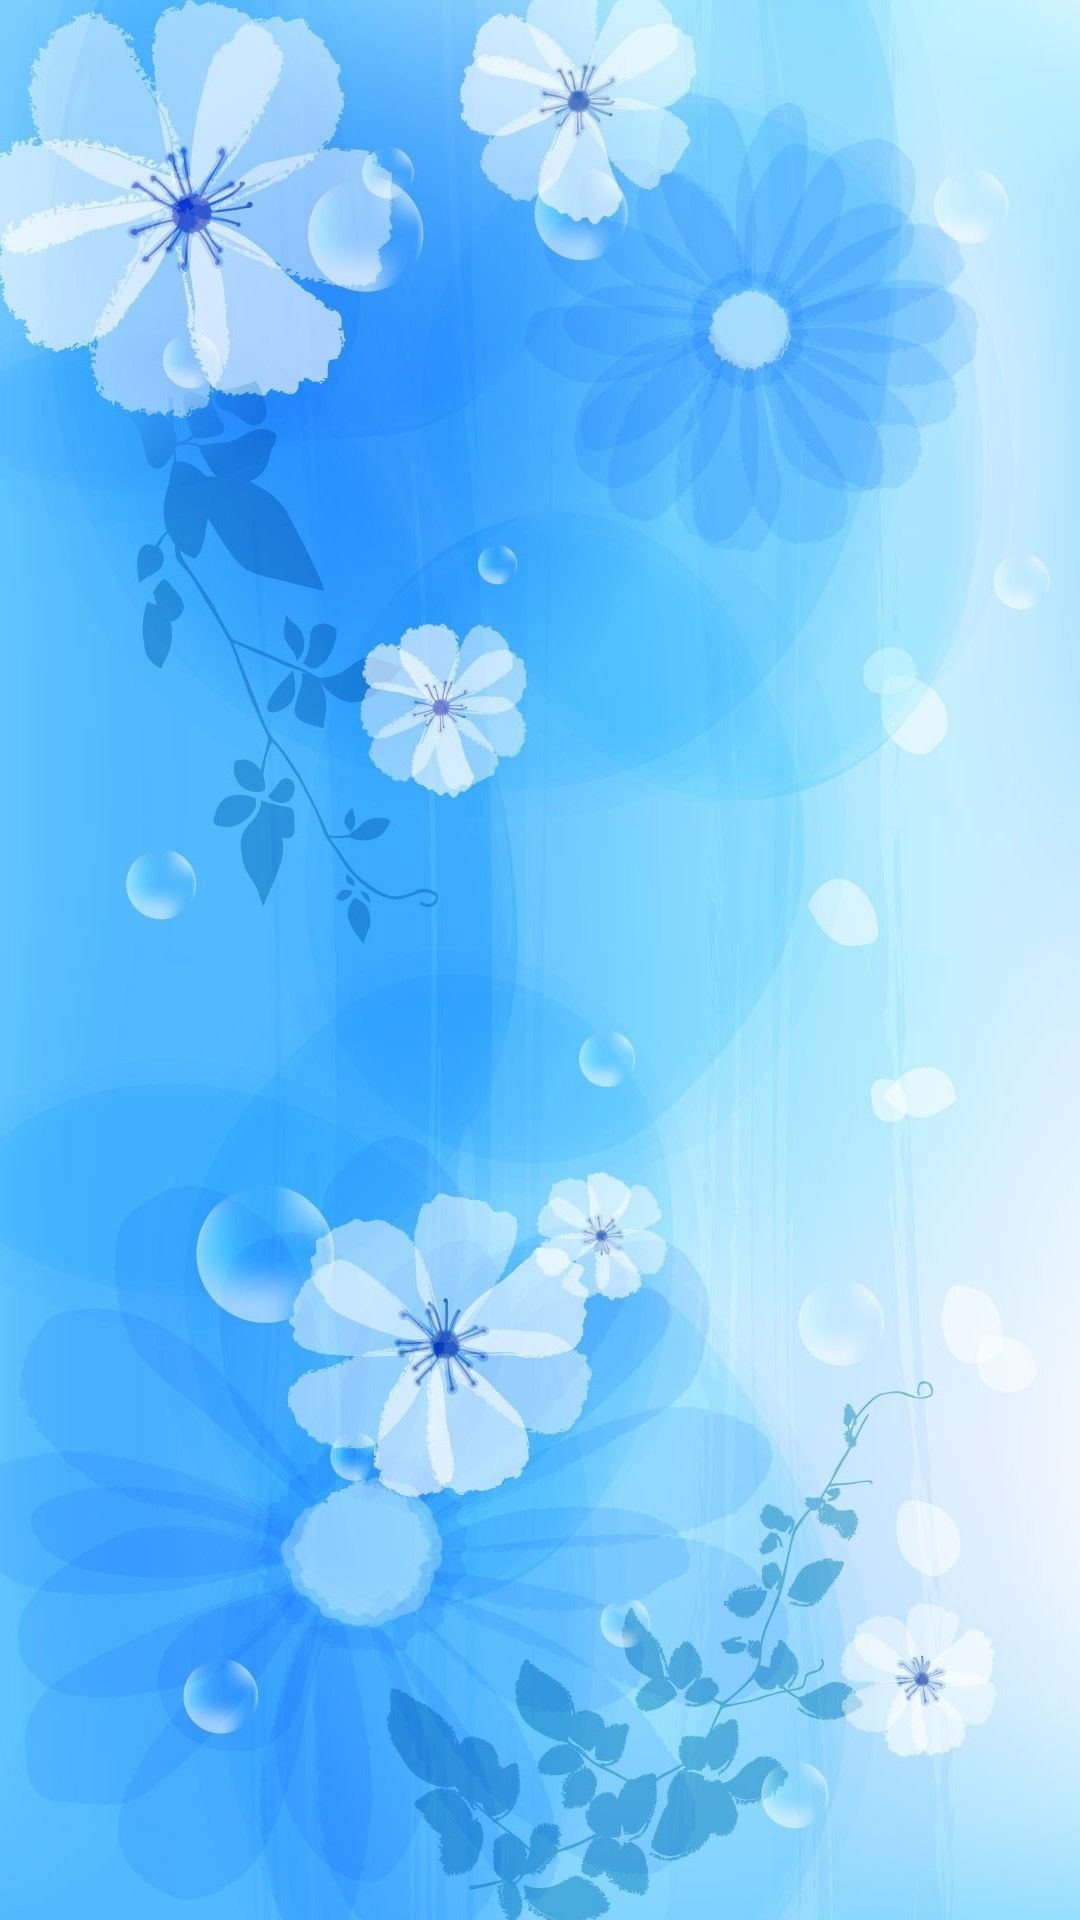 Blue Girly Backgrounds : girly, backgrounds, Girly, Wallpapers, Backgrounds, WallpaperAccess